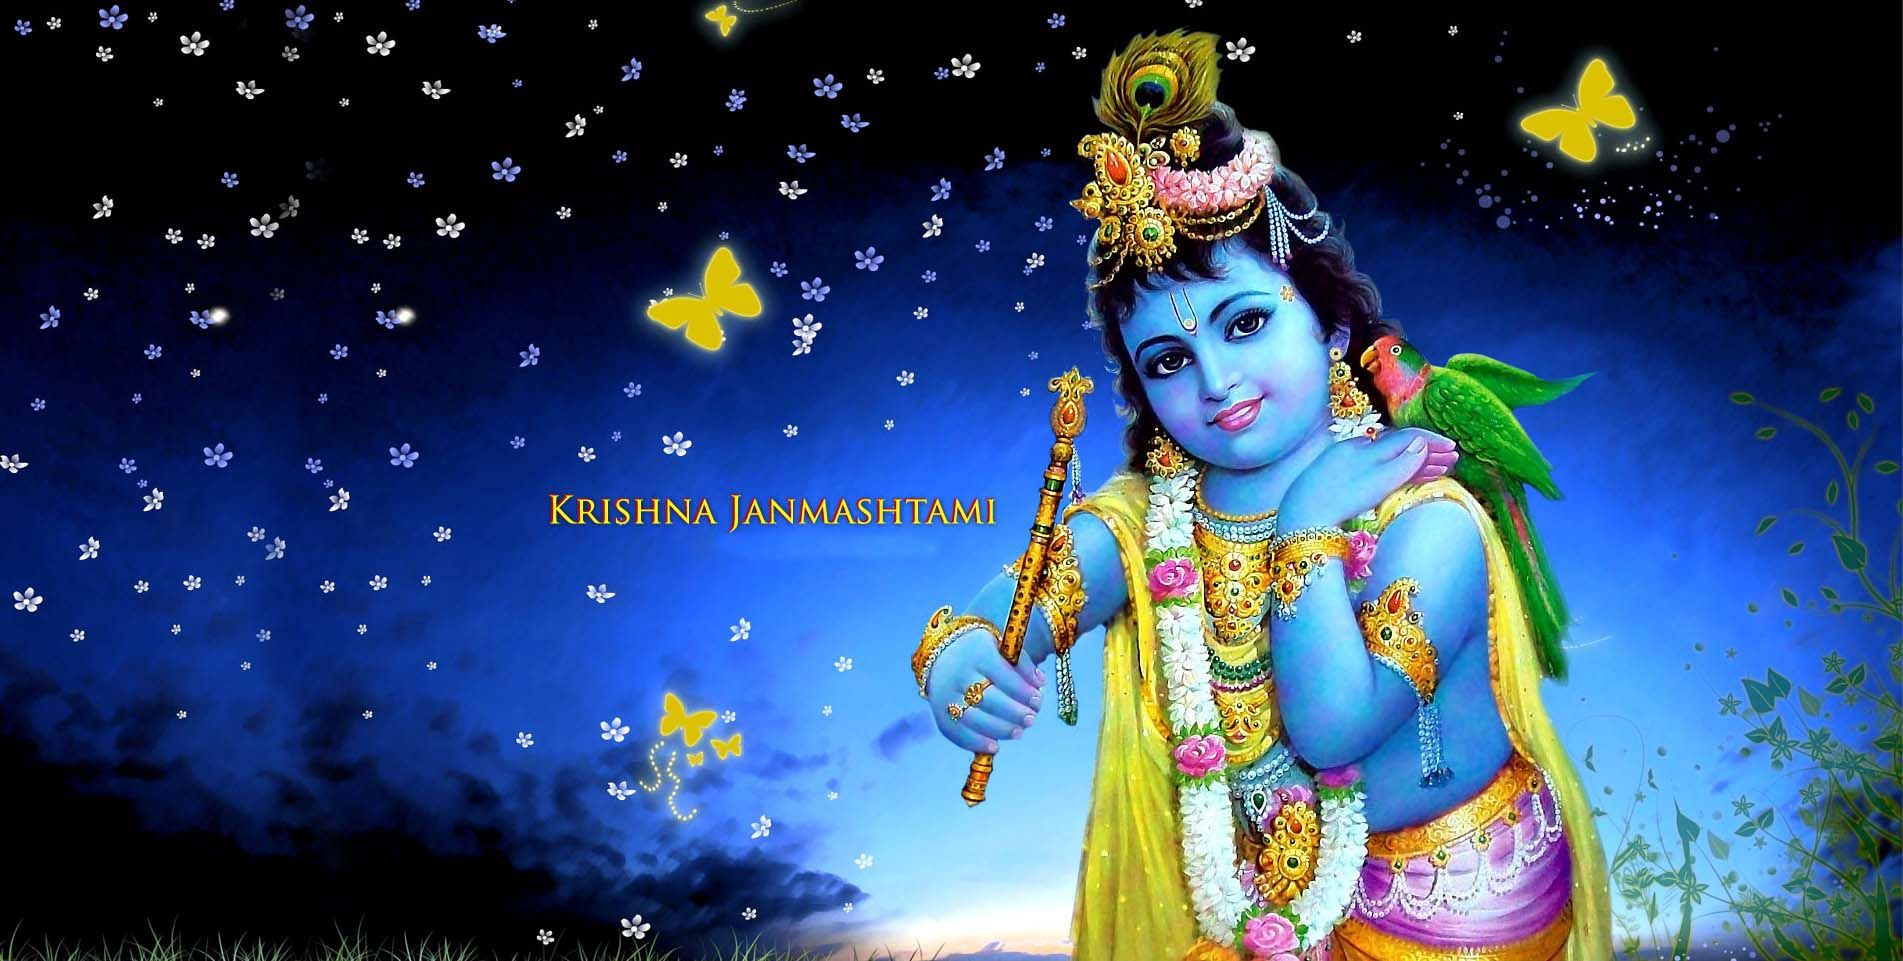 senhor krishna wallpapers hd animada em 3d animado senhor krishna